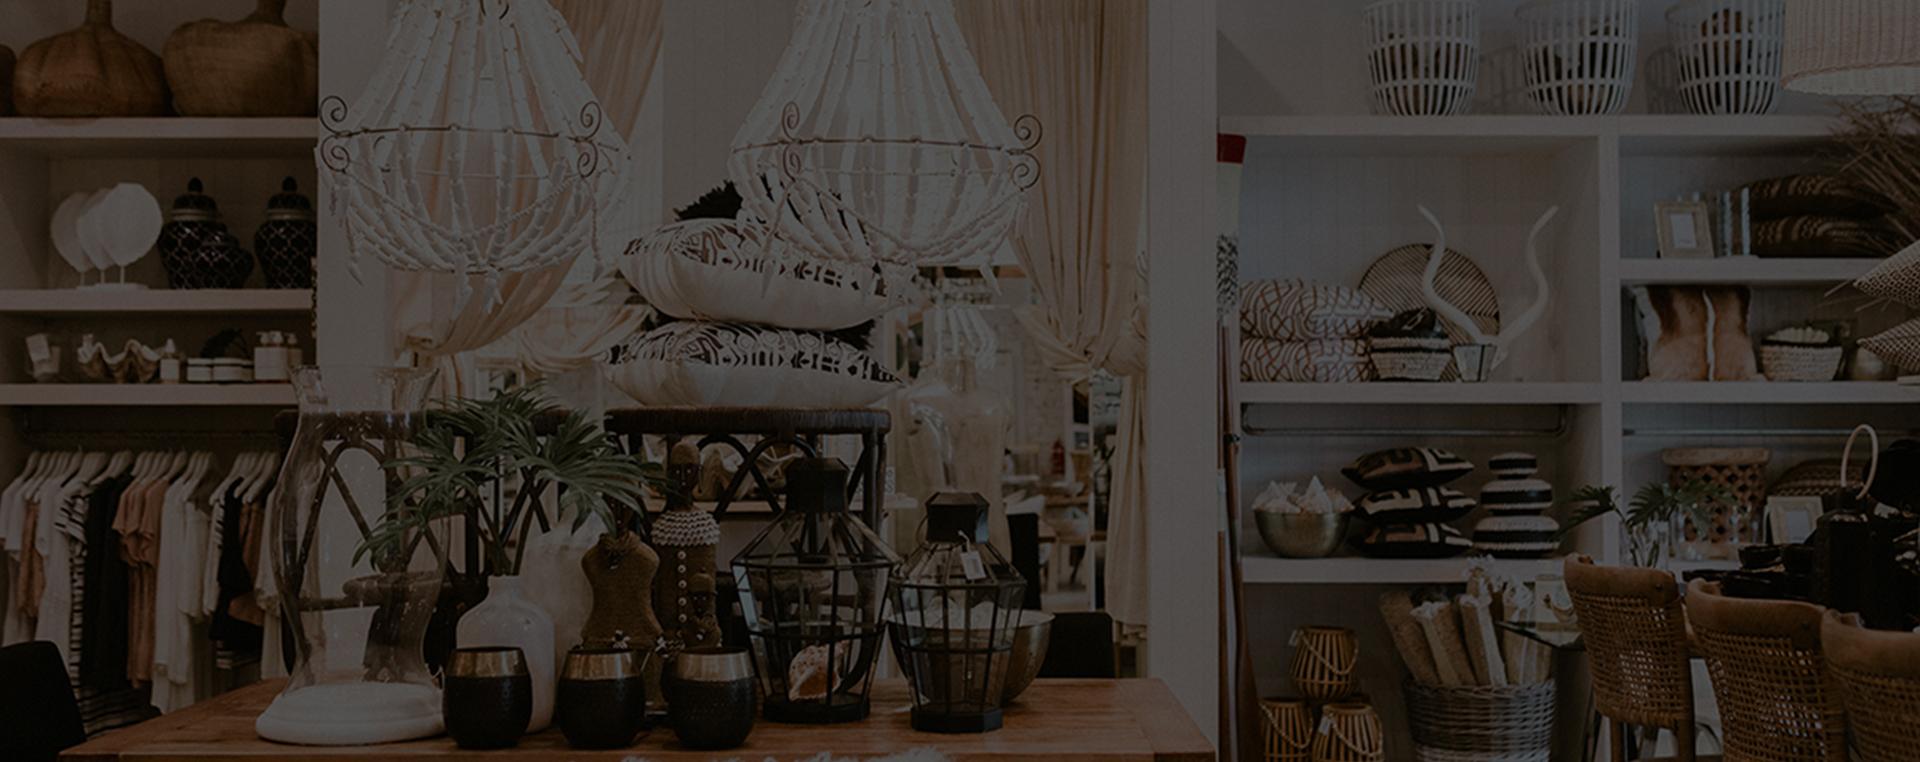 Homeware & Gift Shop